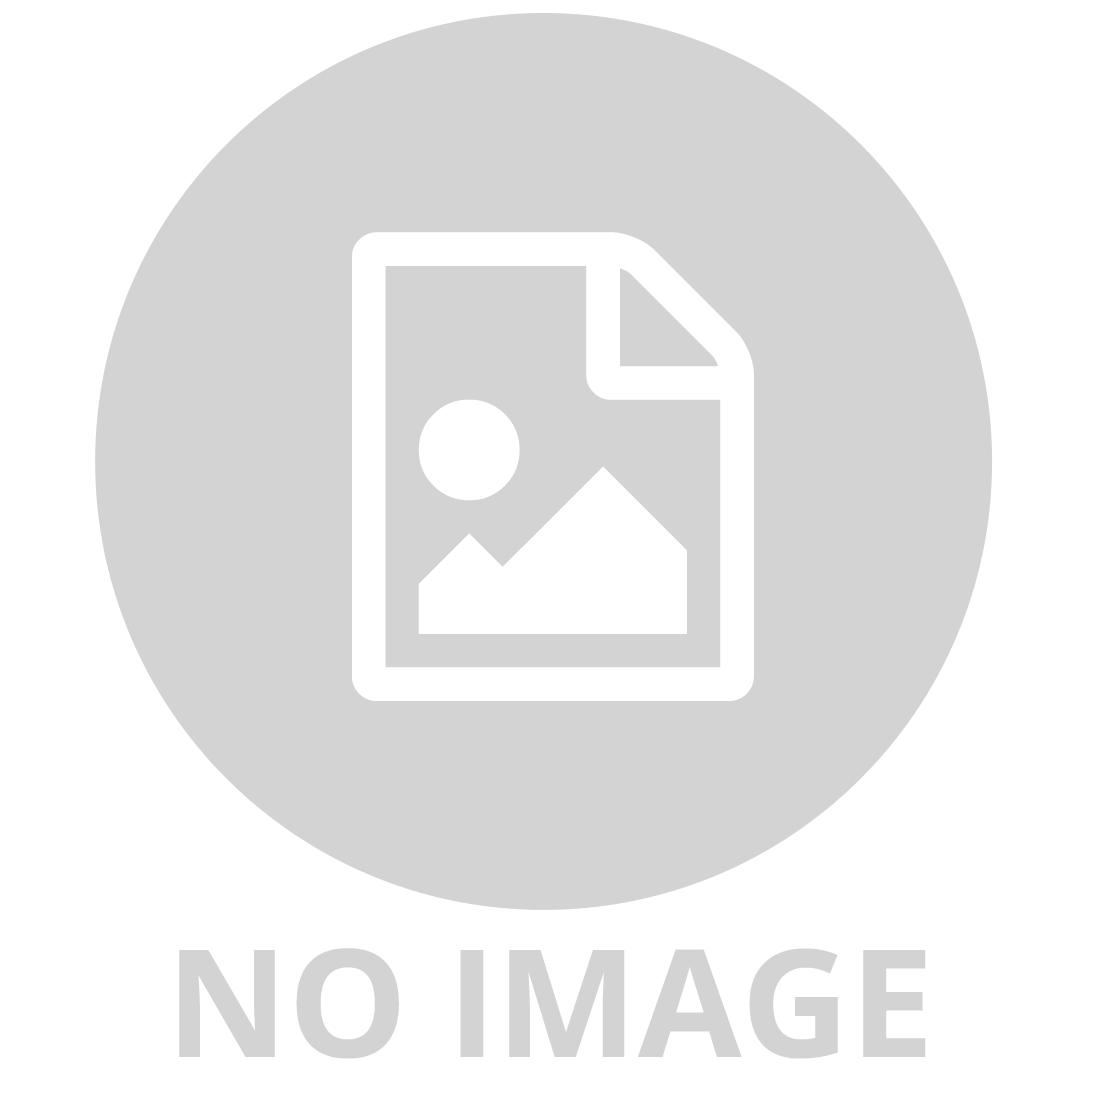 LEGO 75192 STAR WARS ULTIMATE MILLENIUM FALCON